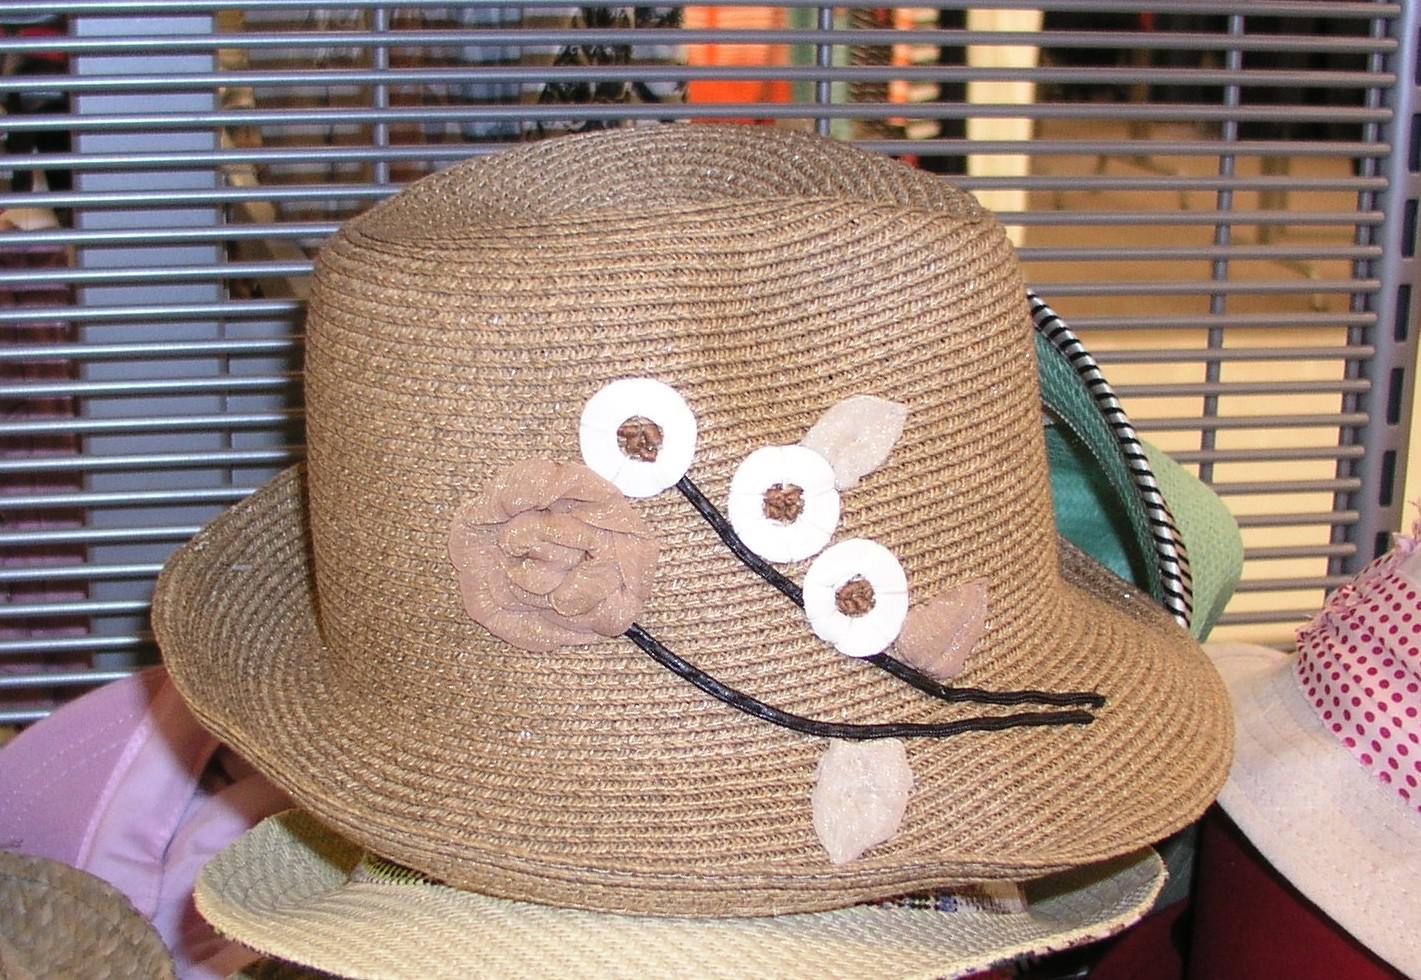 http://4.bp.blogspot.com/_9eBZq26zw50/S8t184VHJ9I/AAAAAAAADs8/P8rbPDXkwxo/s1600/fav+eugenia+kim+hat.JPG